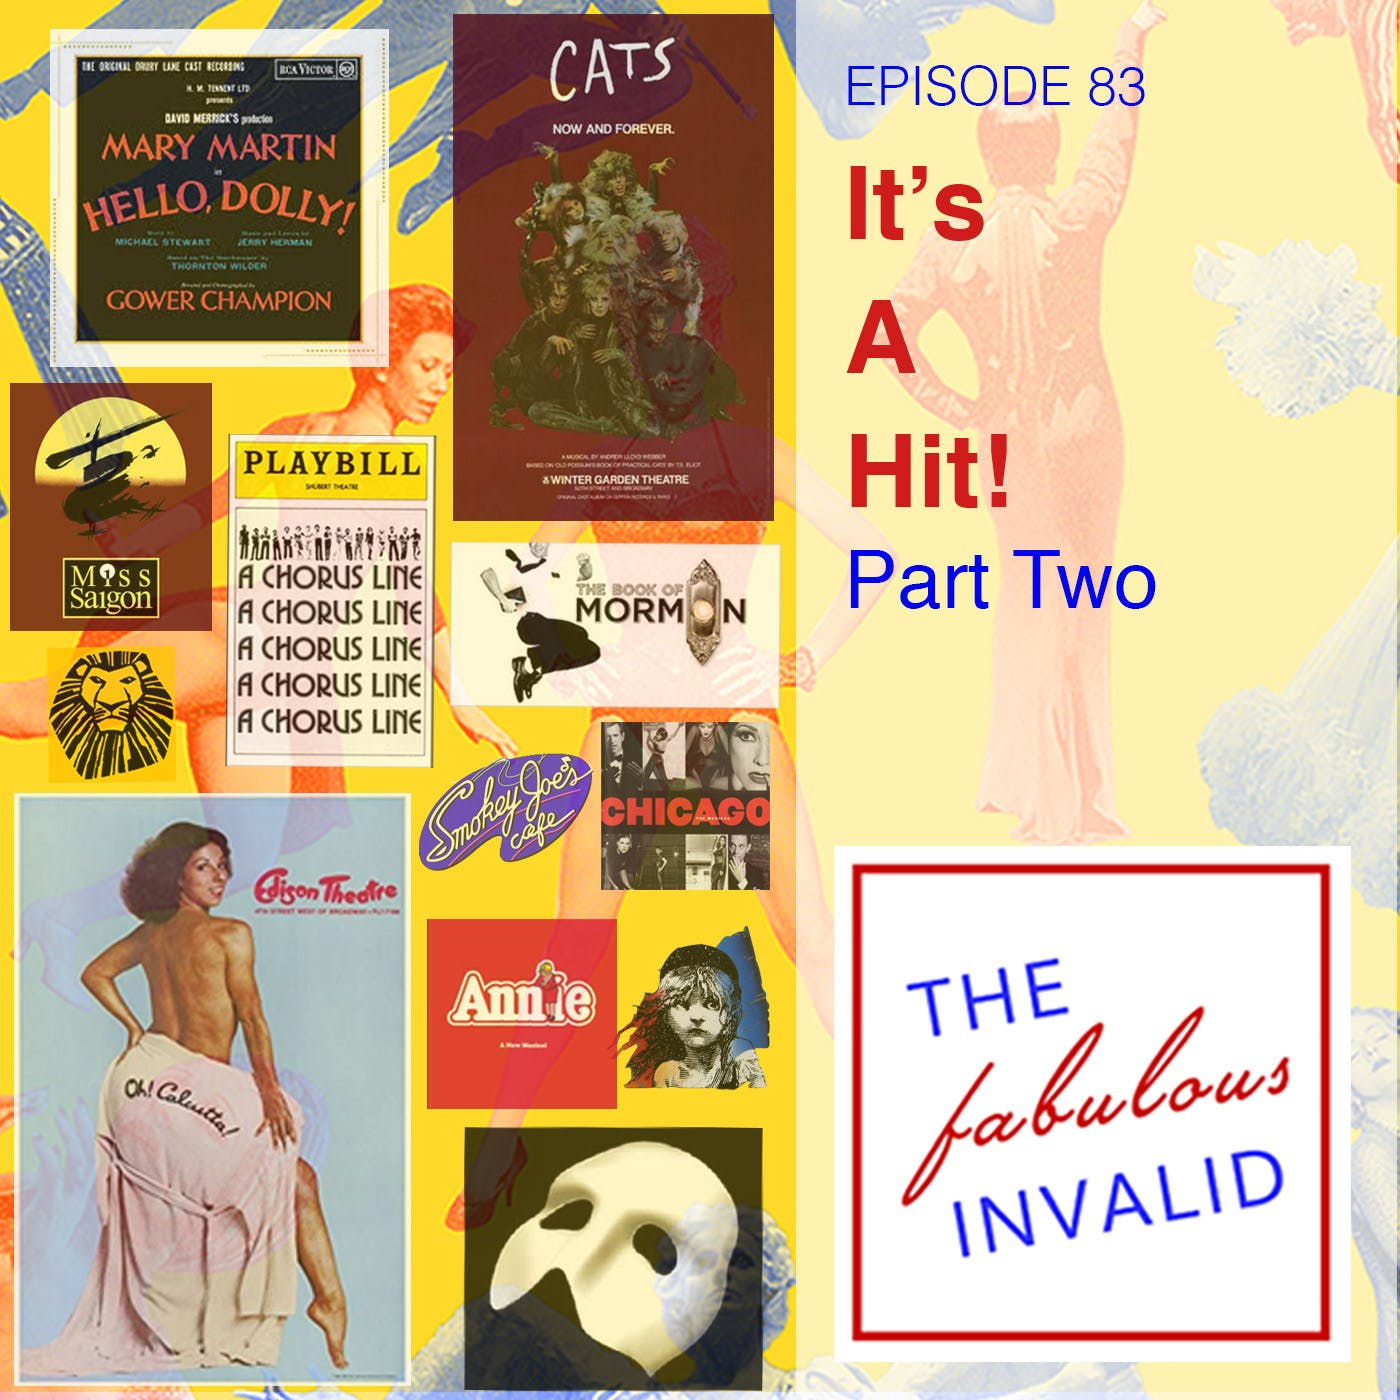 Episode 83: It's A Hit! Part Two